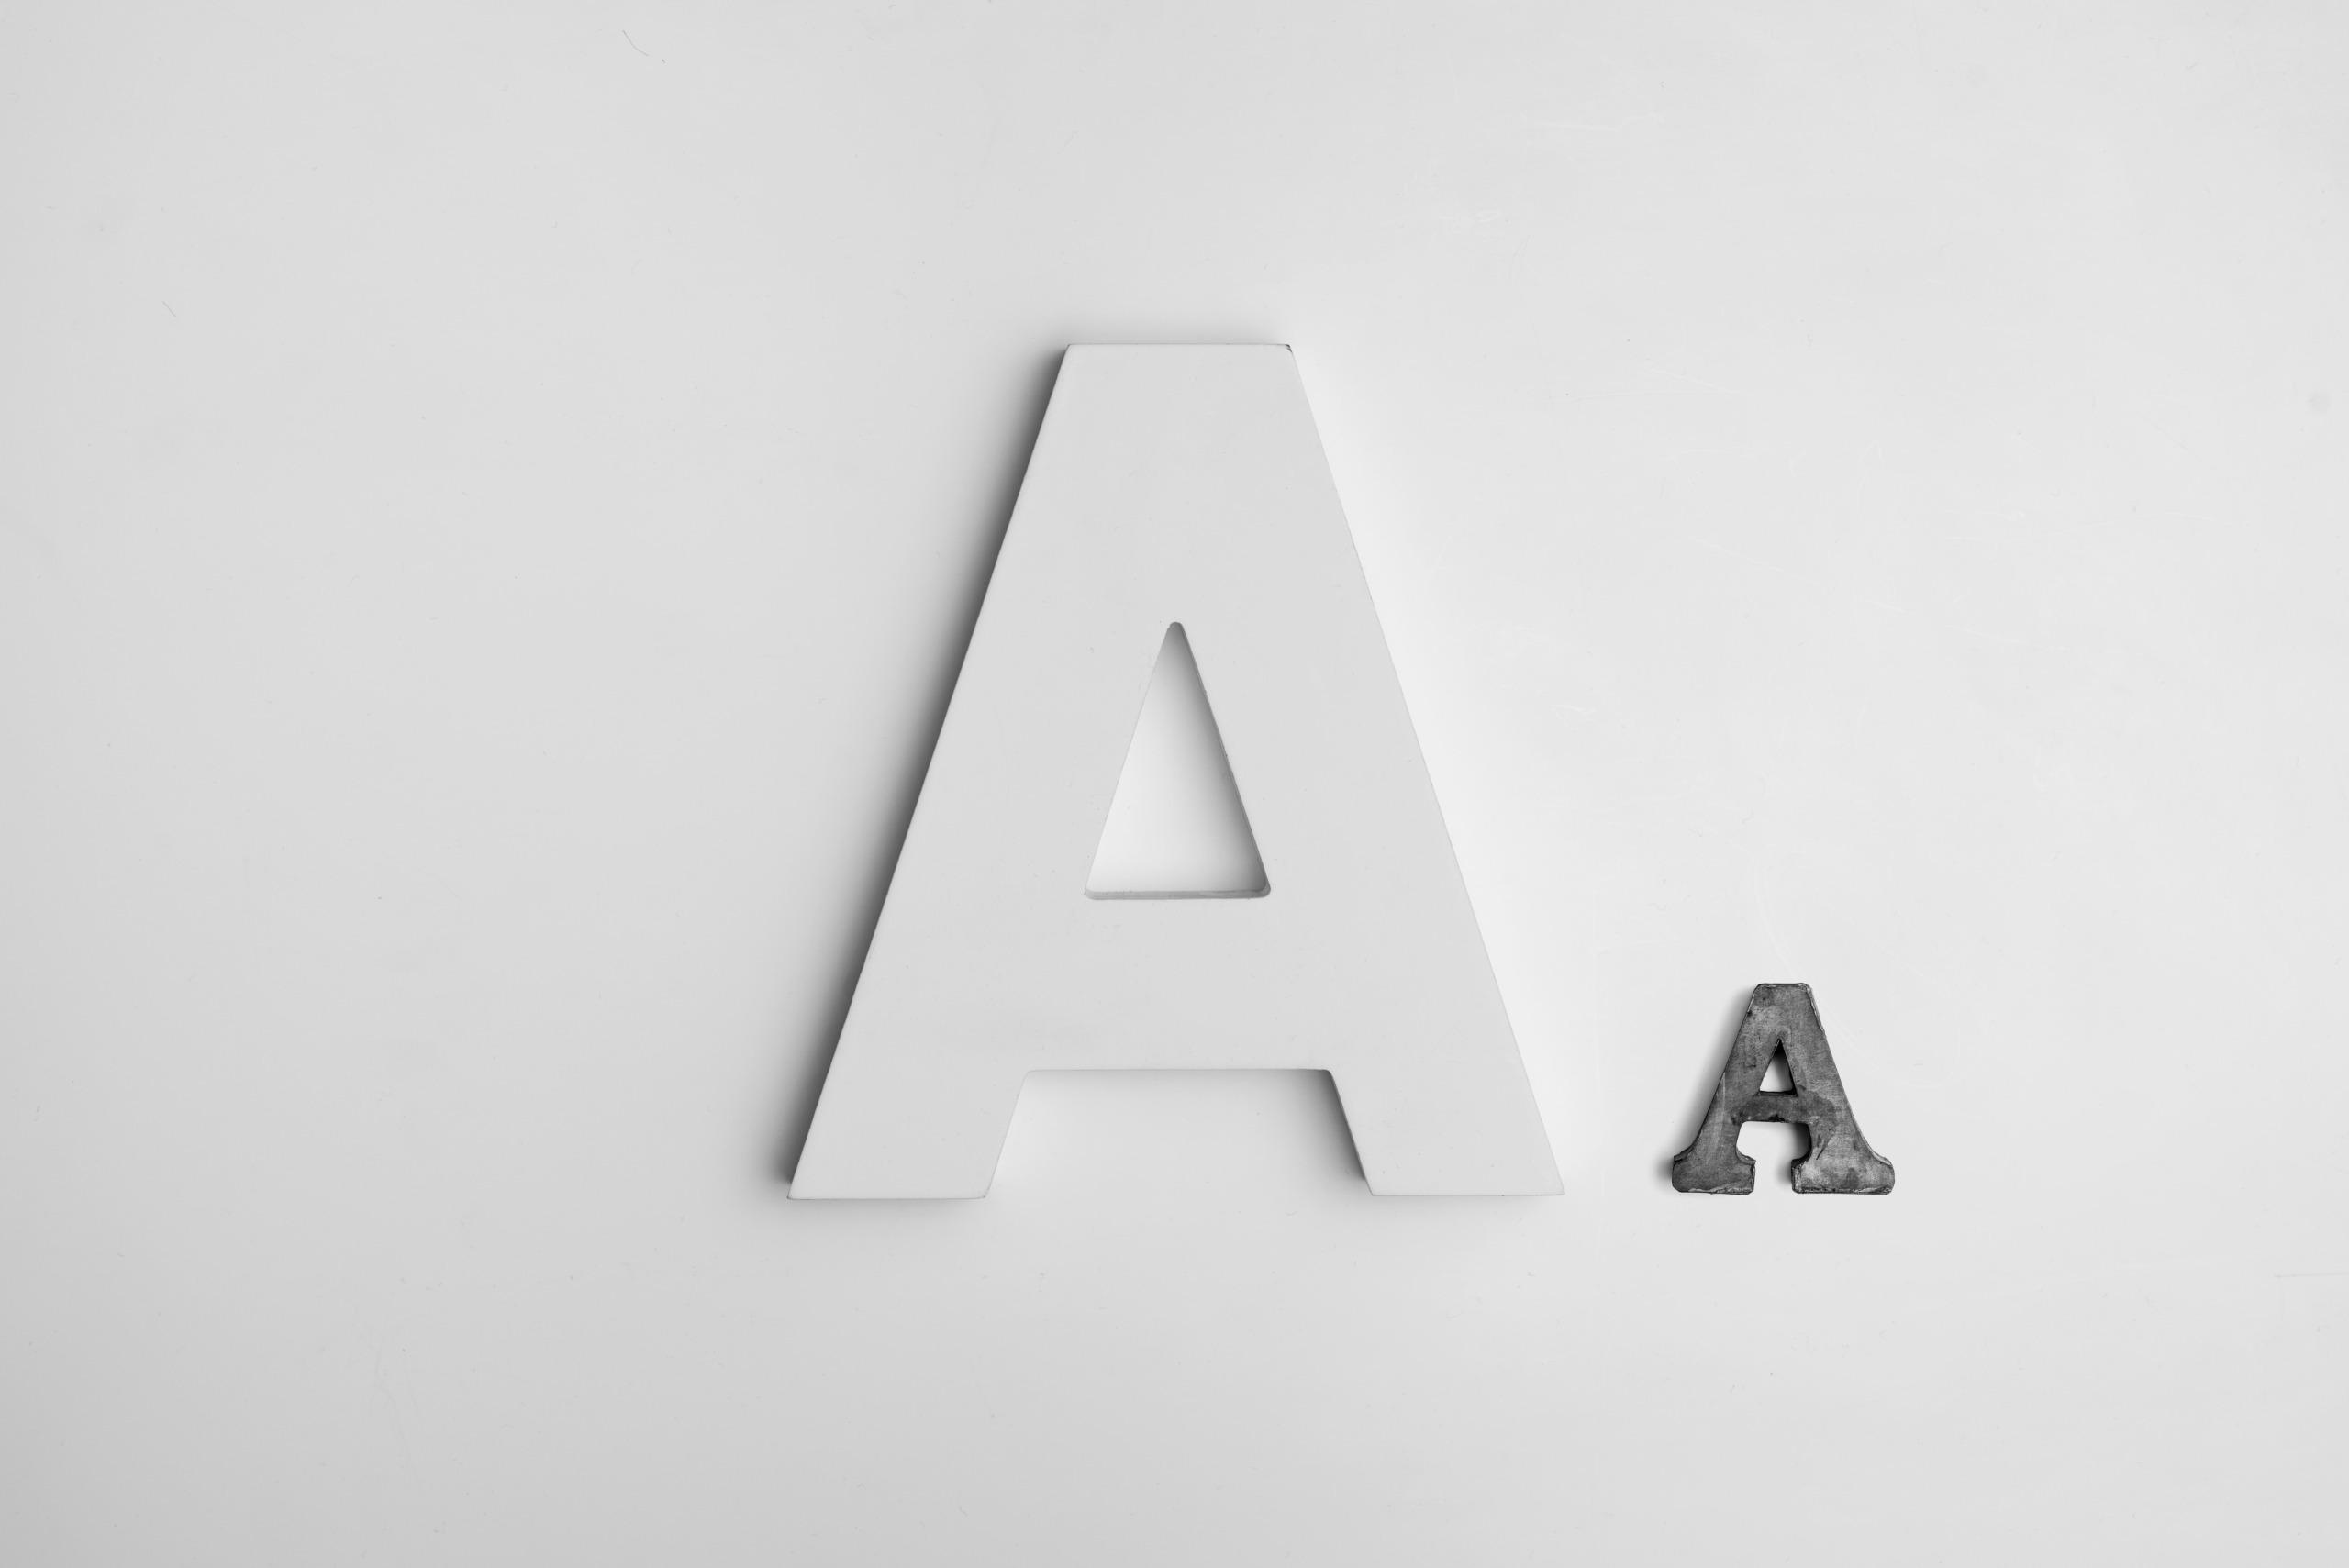 Letter size comparison by Alexander Andrews @ Unsplash